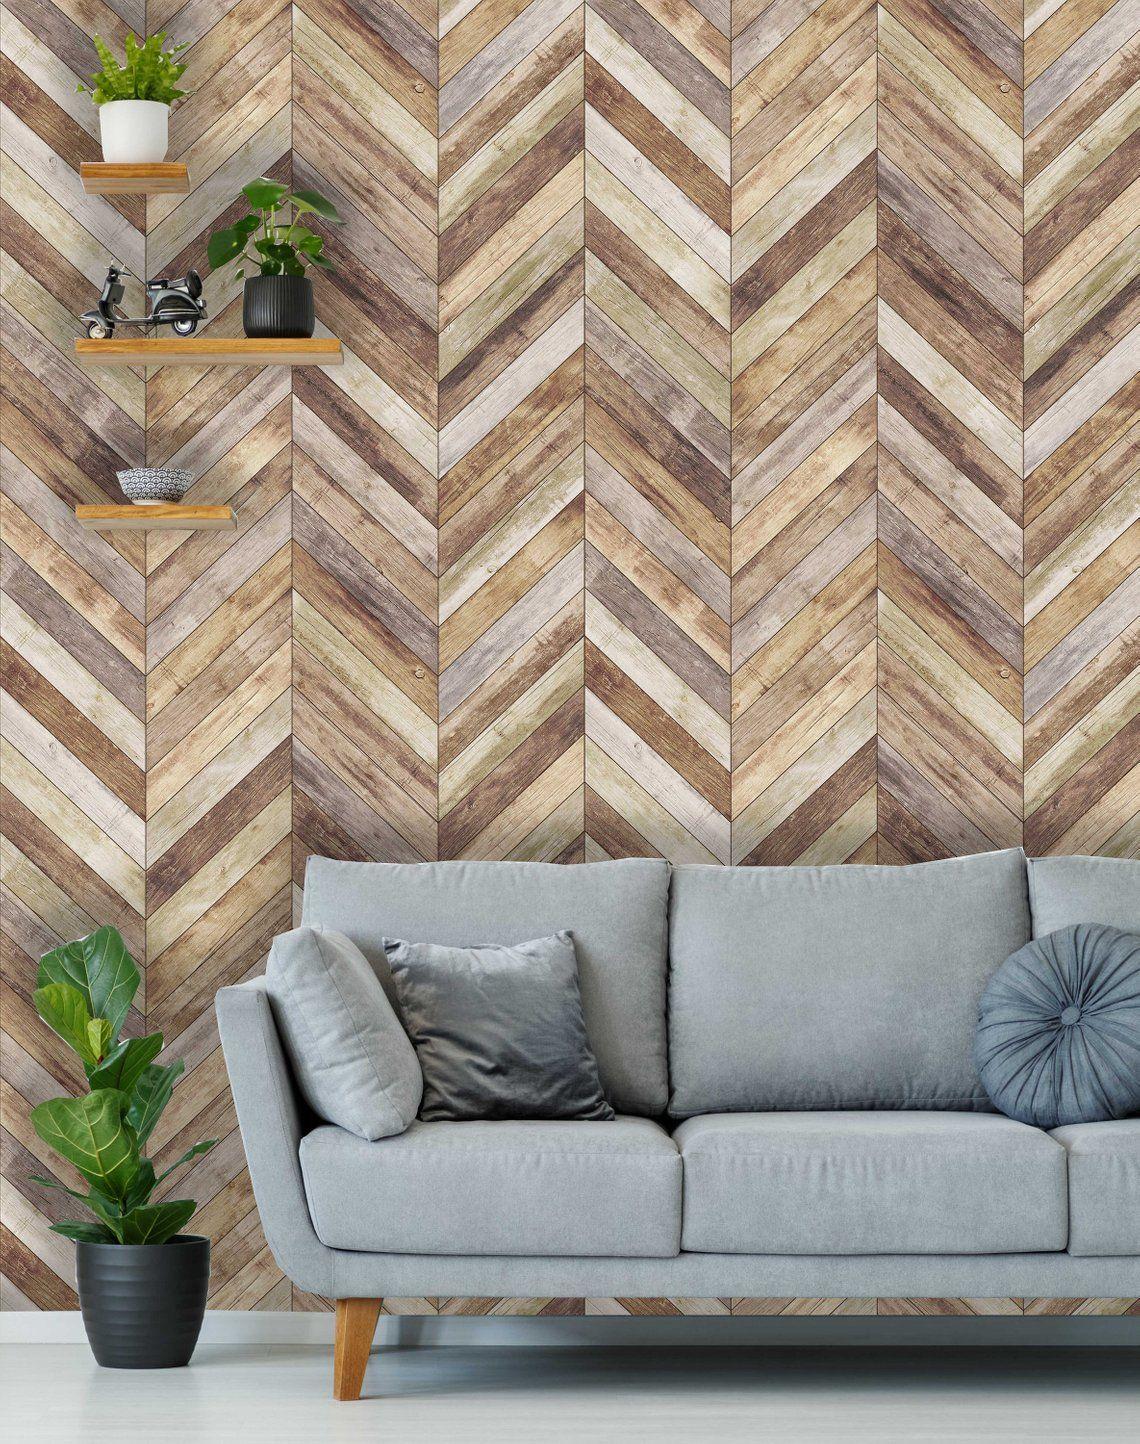 Removable Peel 'n Stick Wallpaper, SelfAdhesive Wall